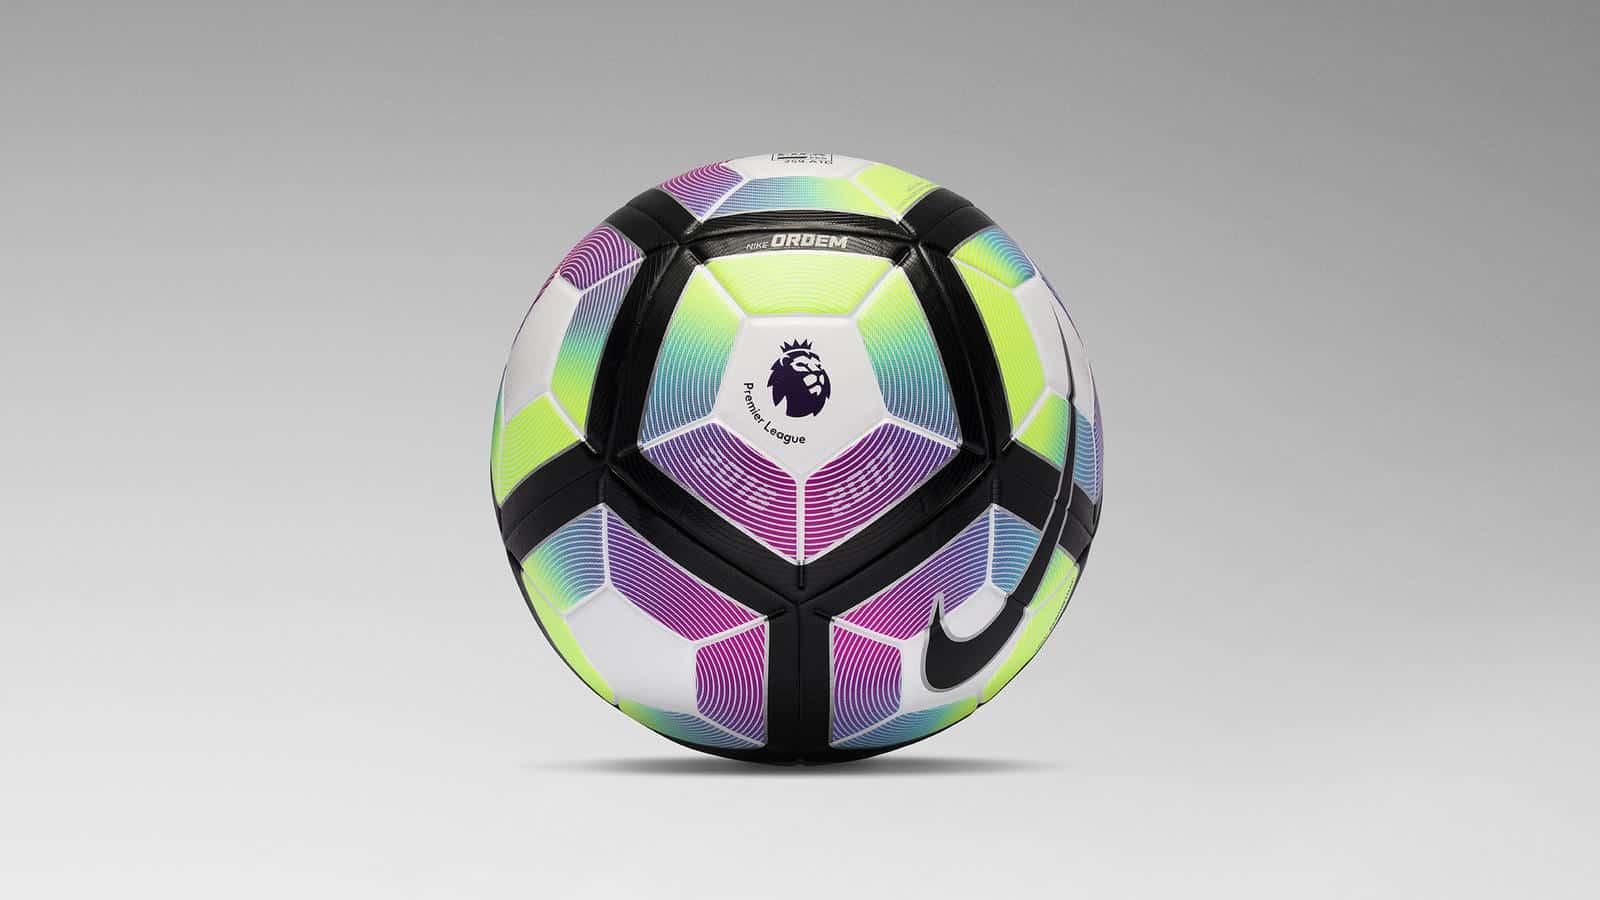 ballon-nike-ordem-4-premier-league